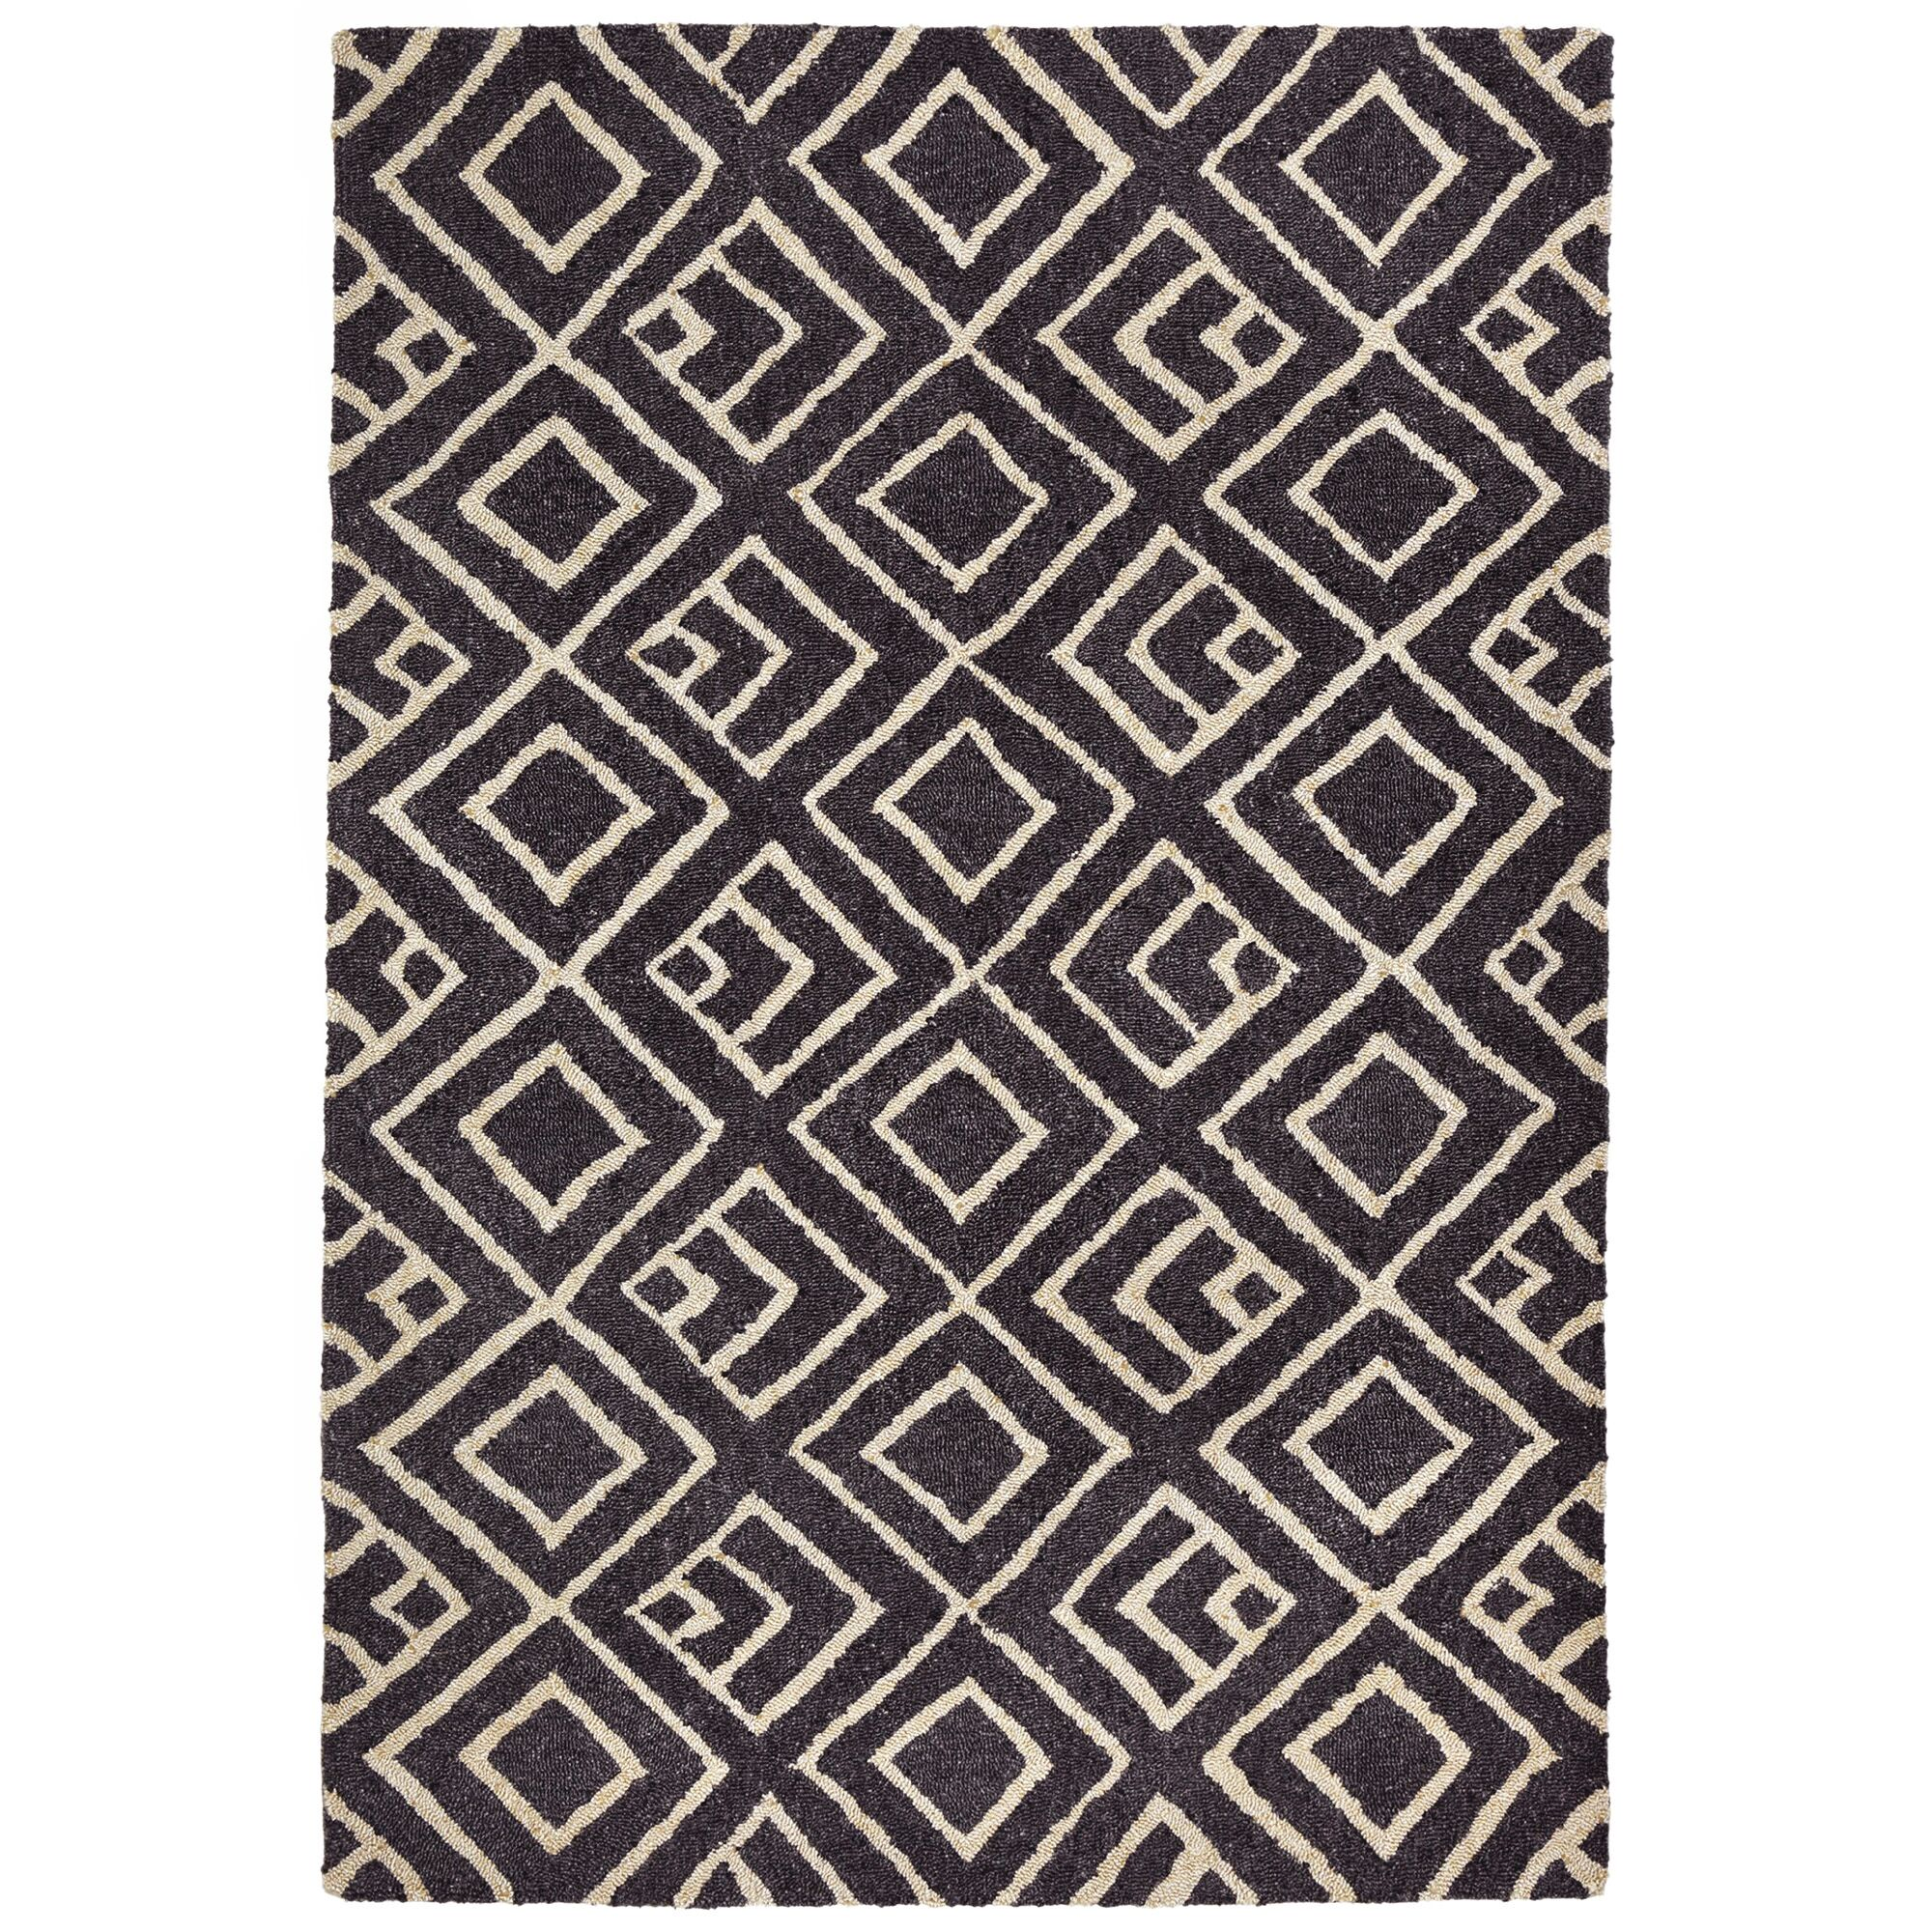 Chamness Hand-Tufted Charcoal/Beige Indoor/Outdoor Area Rug Rug Size: 7'6